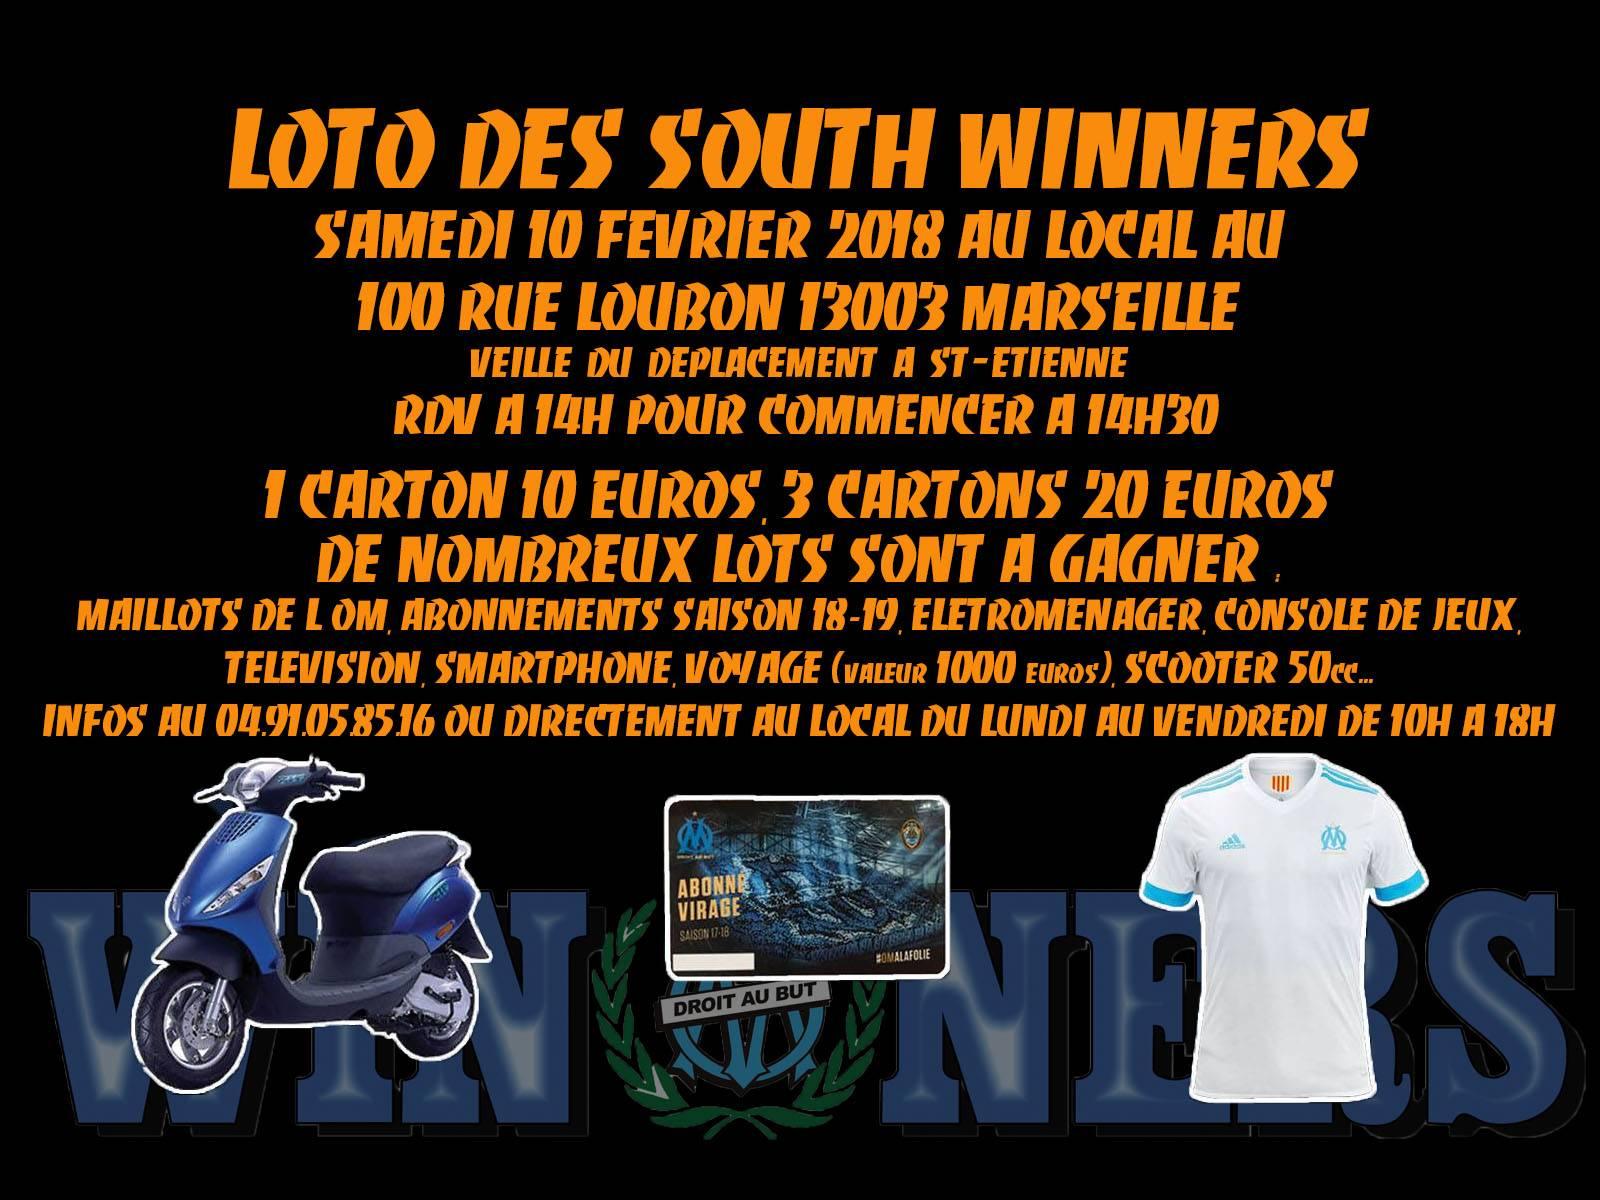 LOTO SOUTH WINNERS SAMEDI 10 FEVRIER 2018 A PARTIR DE 14H